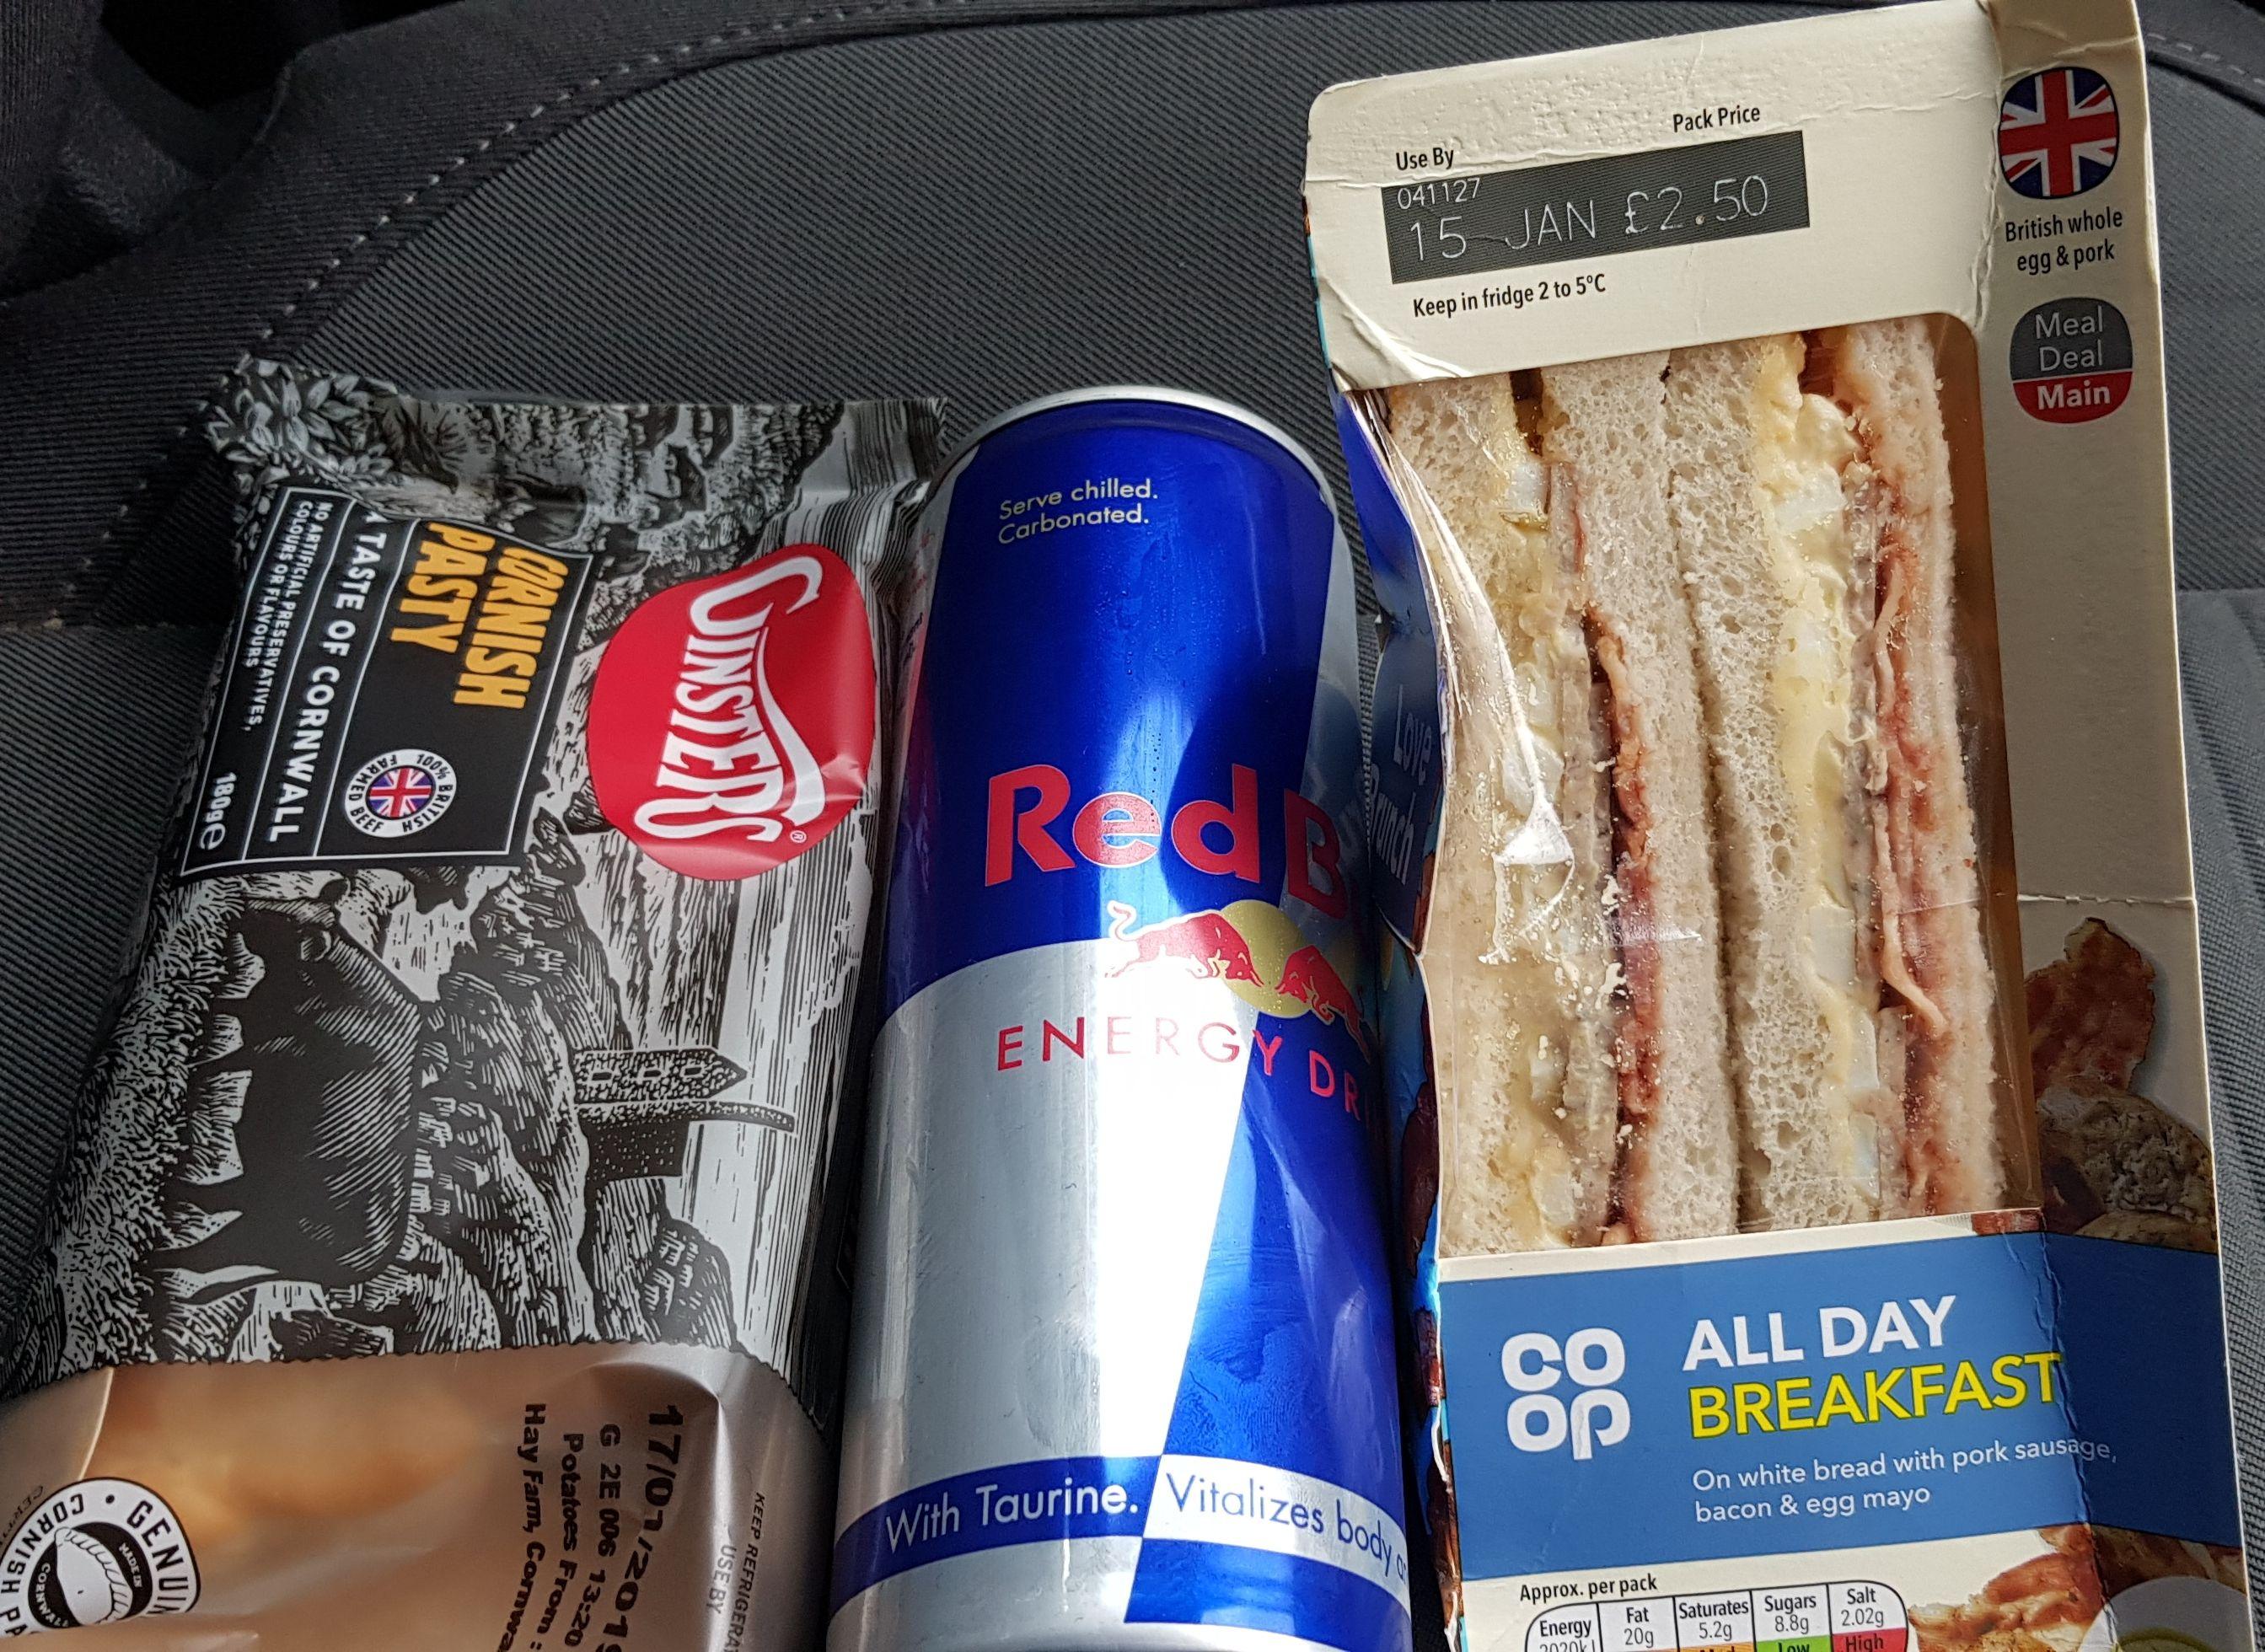 Sandwich Meal deal @ Co-op for £3.50